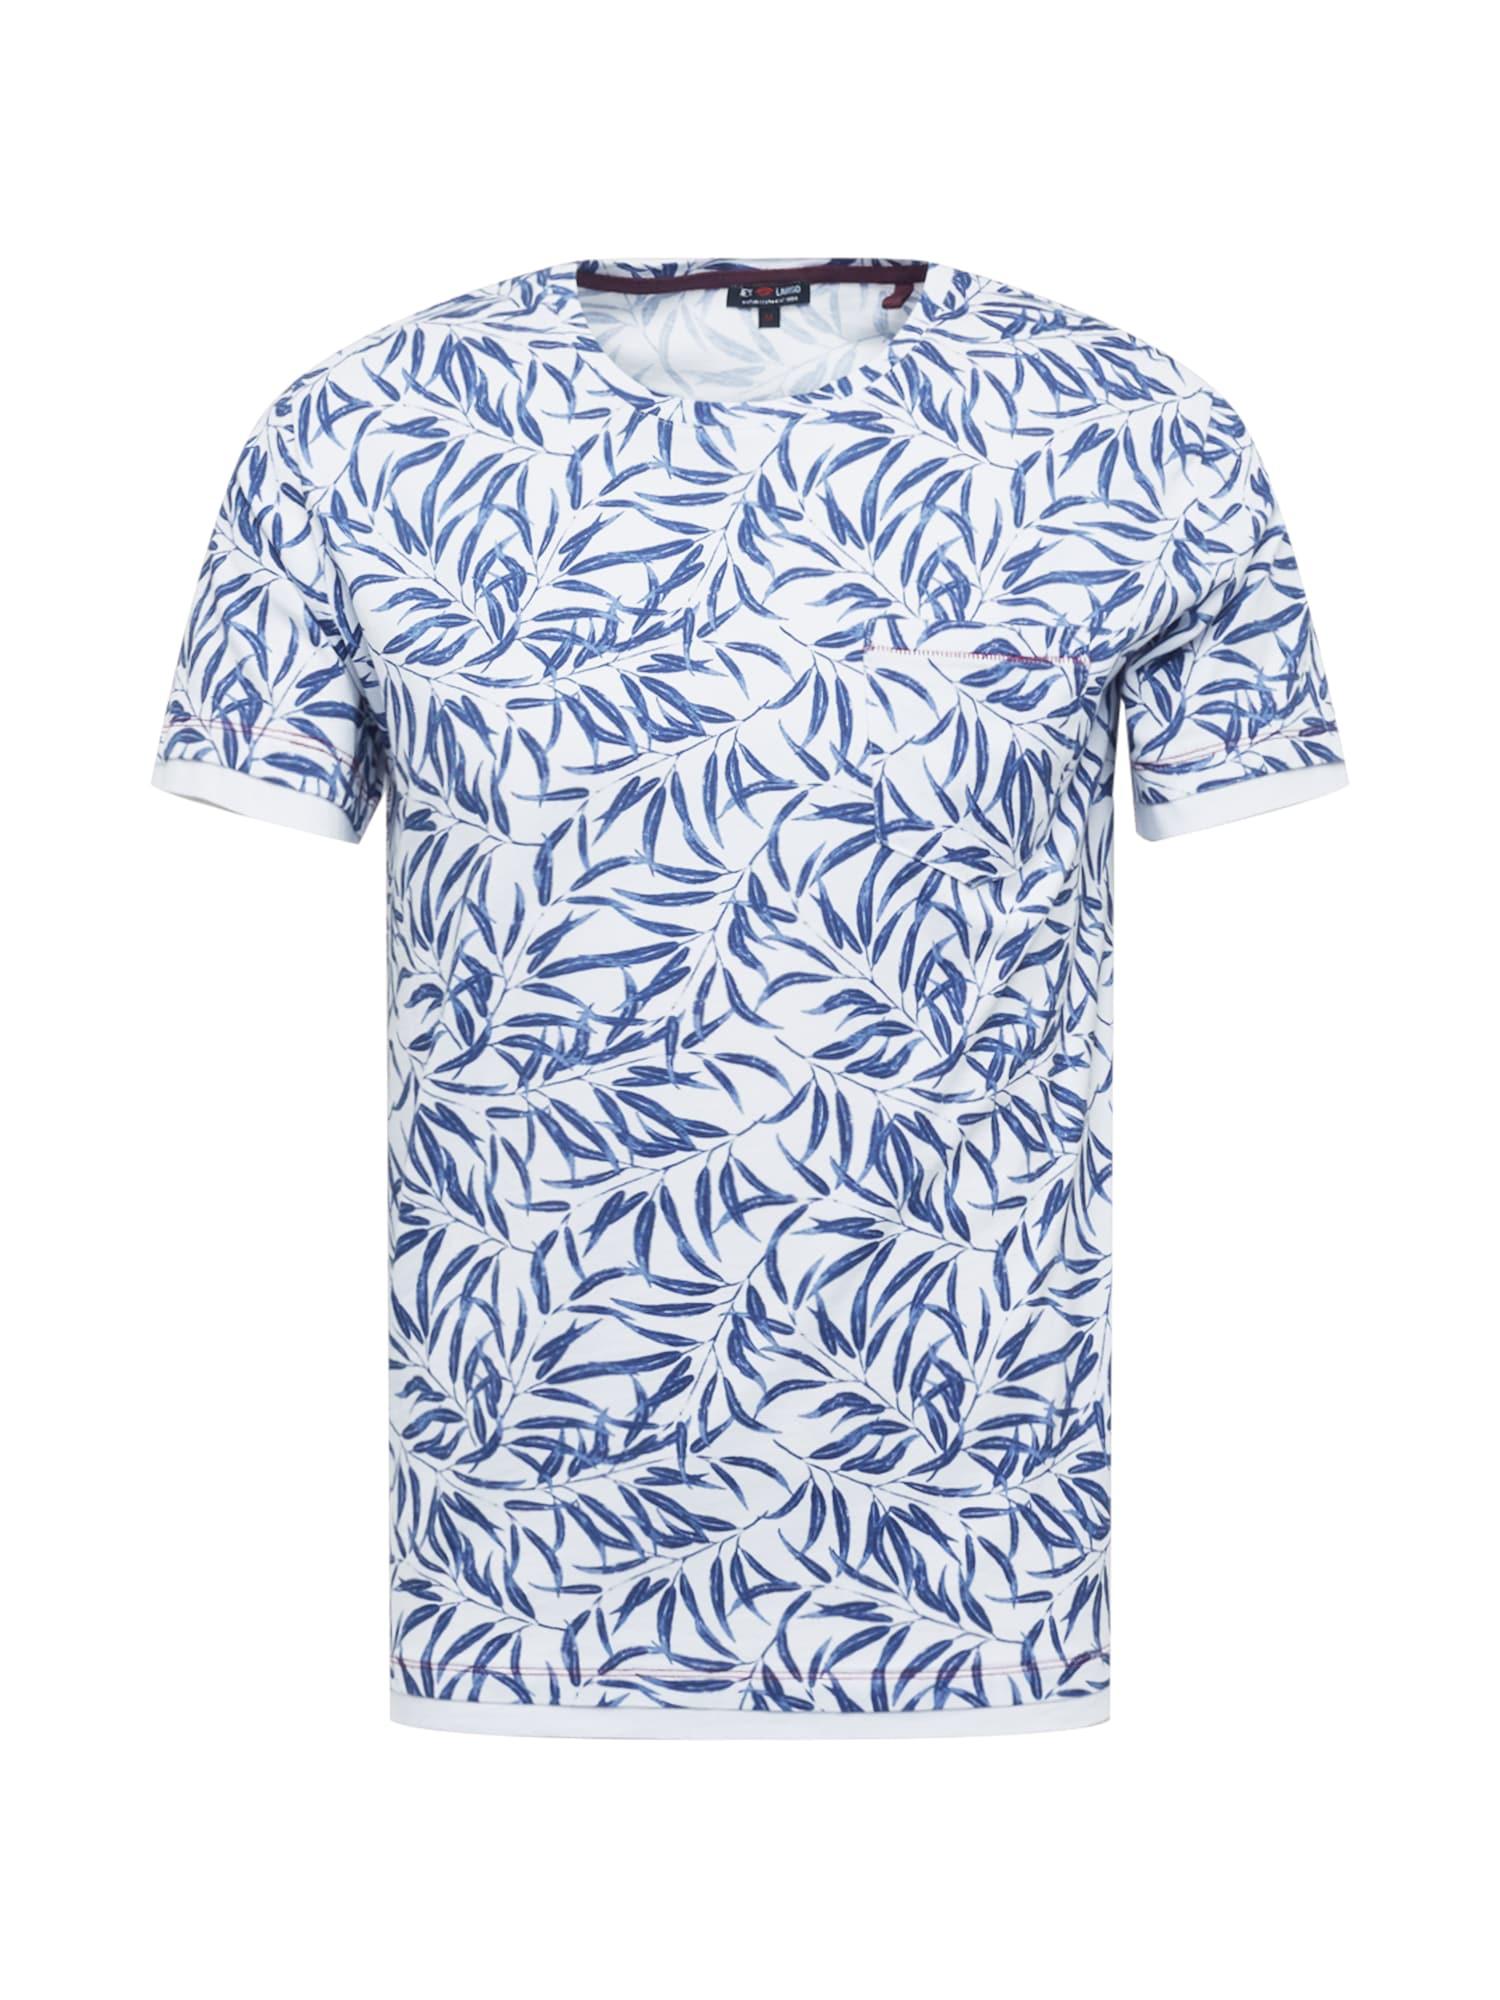 Key Largo T-Shirt 'LOCATION'  - Blanc, Bleu - Taille: M - male